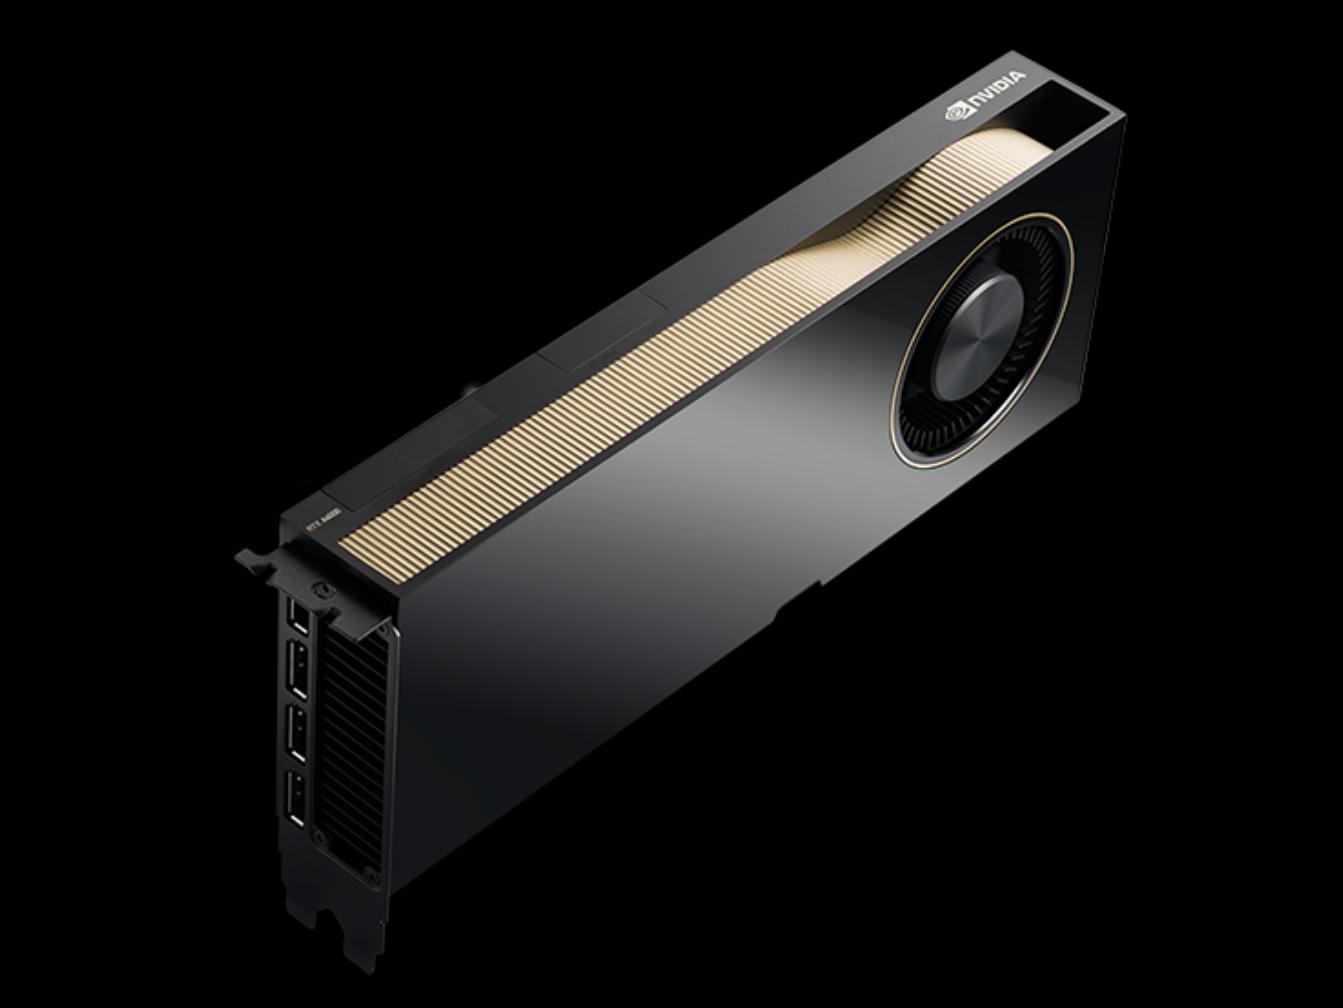 NVIDIA RTX A6000 48 GB Workstation Graphics Card Dengan Full GA102 GPU